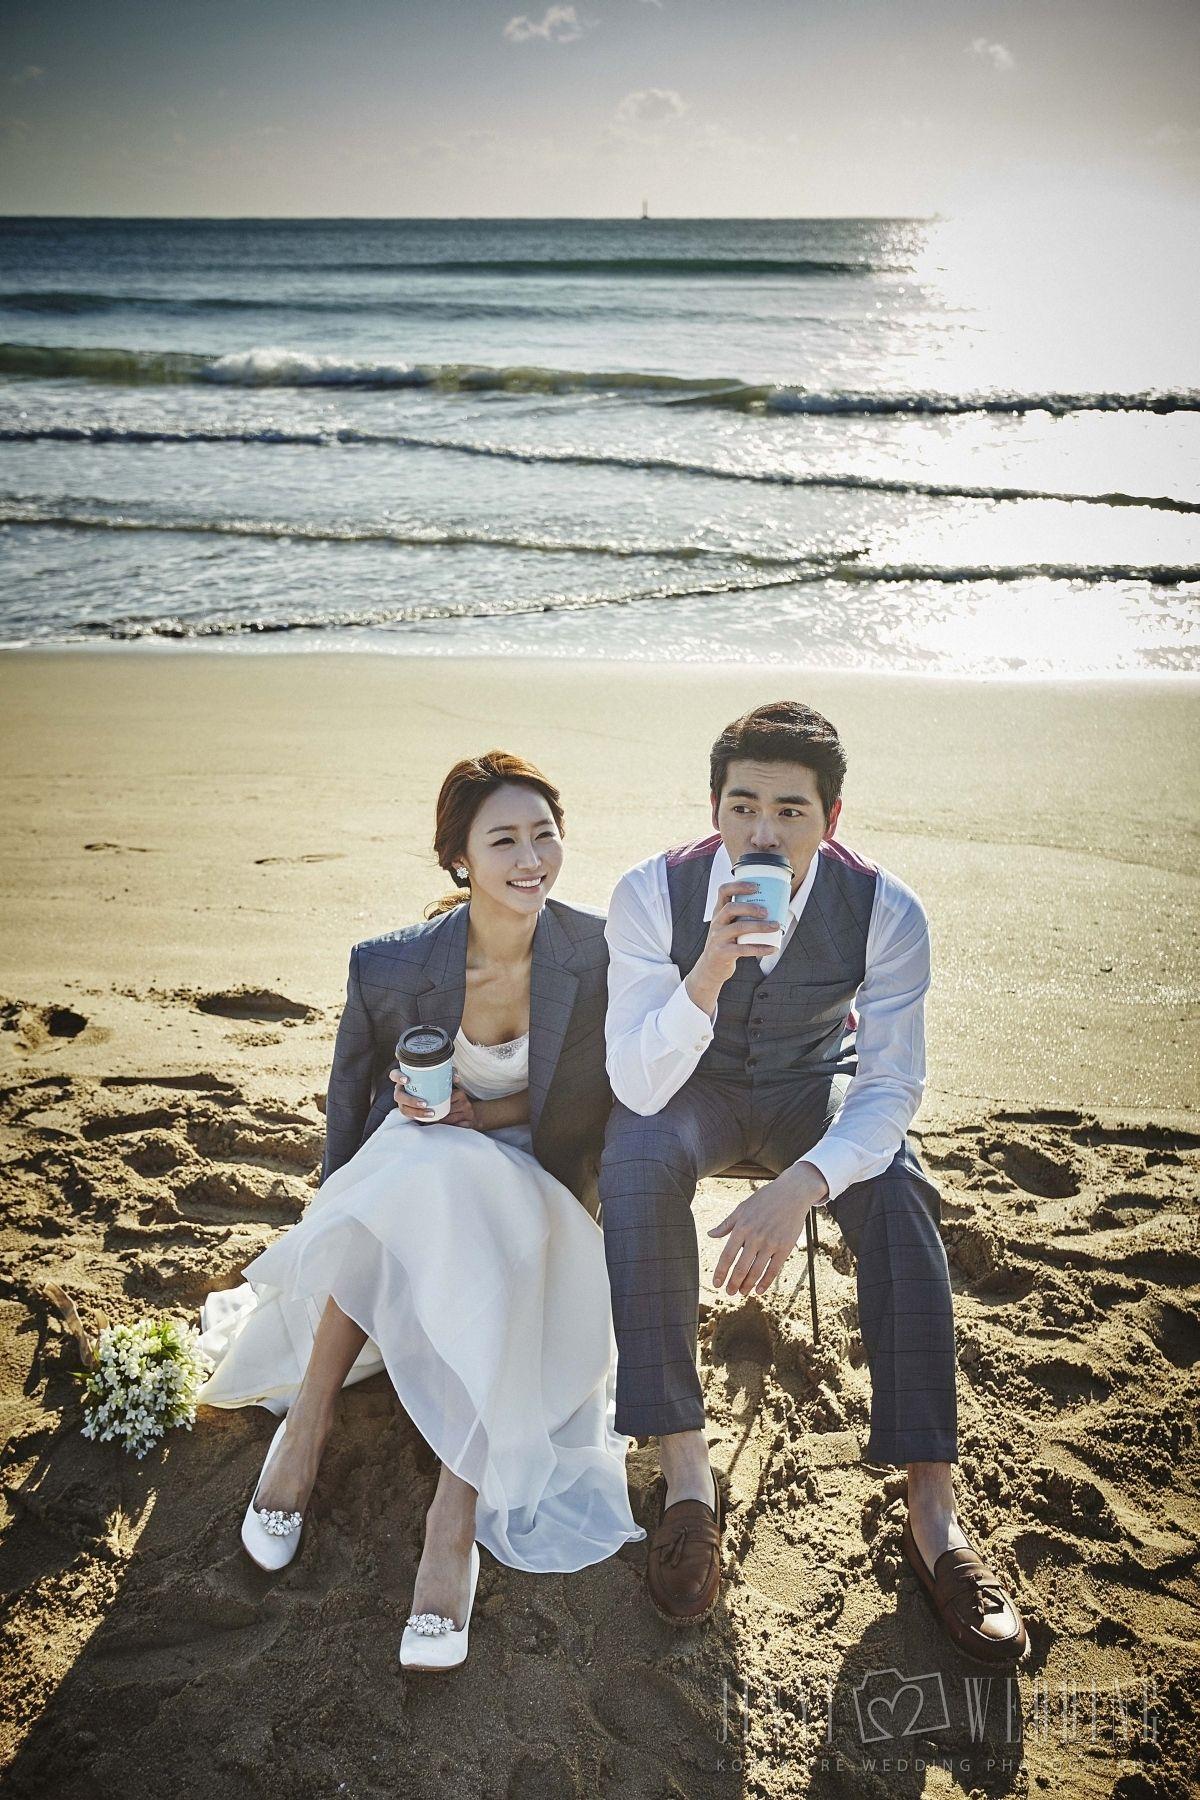 Pre wedding beach  JINYI WEDDING  야외웨딩관려ㄴ  Pinterest  Weddings Wedding and